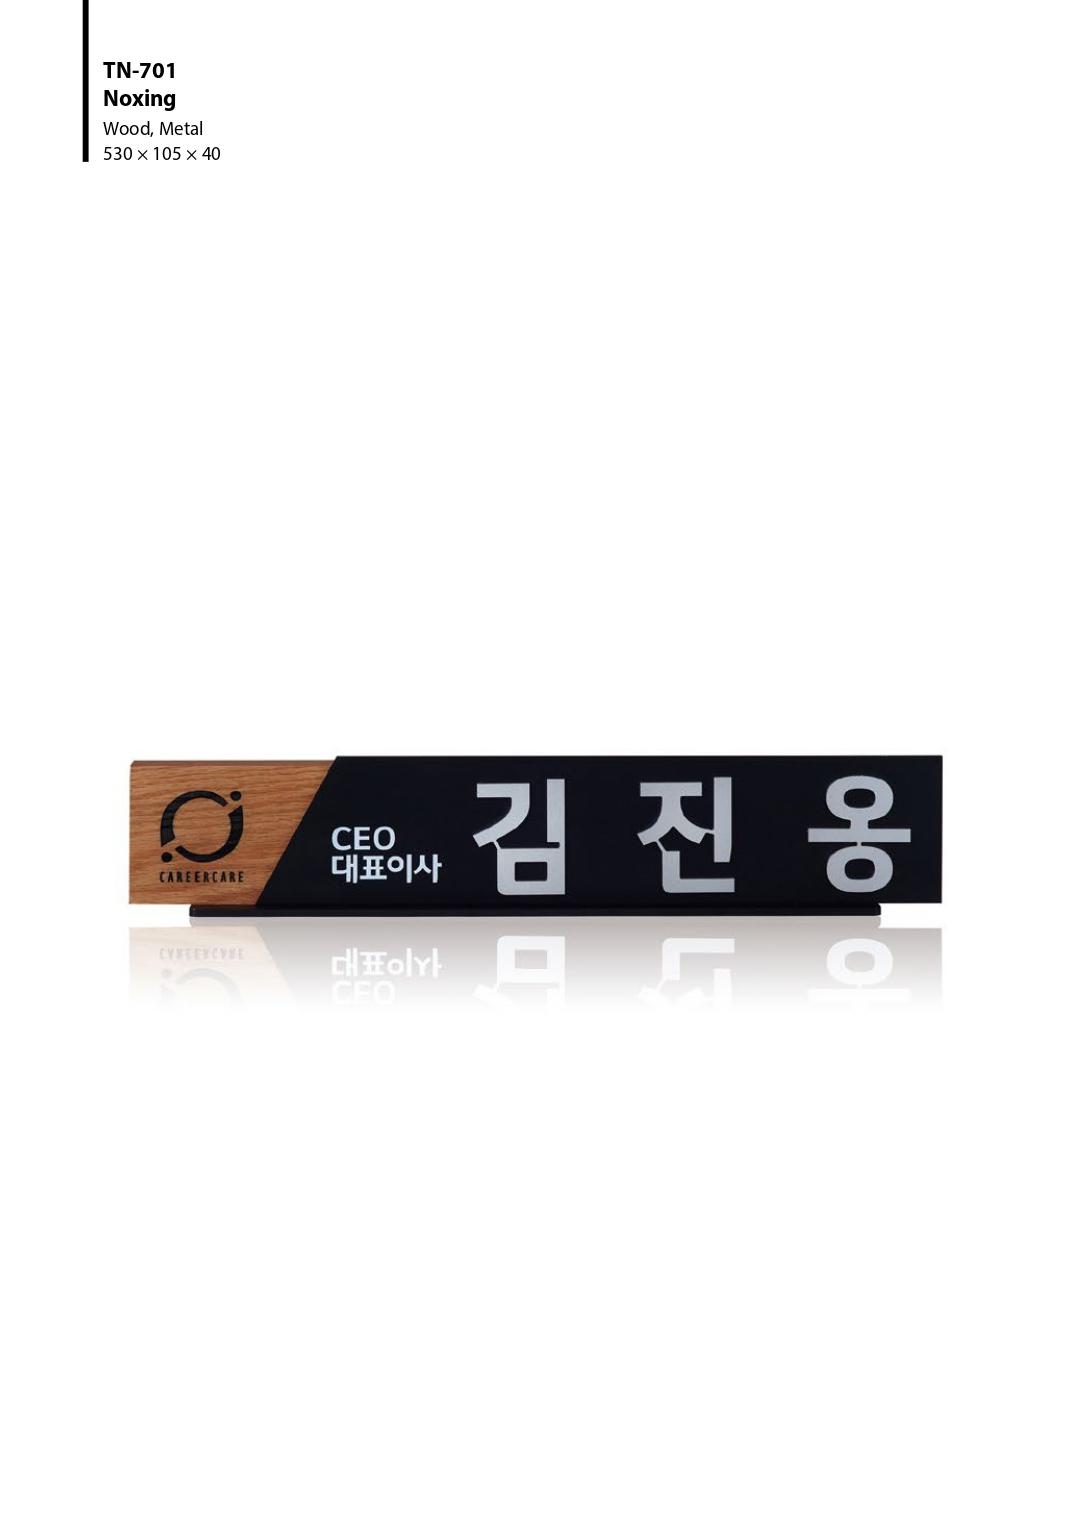 KLPK44001 Noxing 나무 메탈 명패 상패 트로피 판촉물 제작 케이엘피코리아